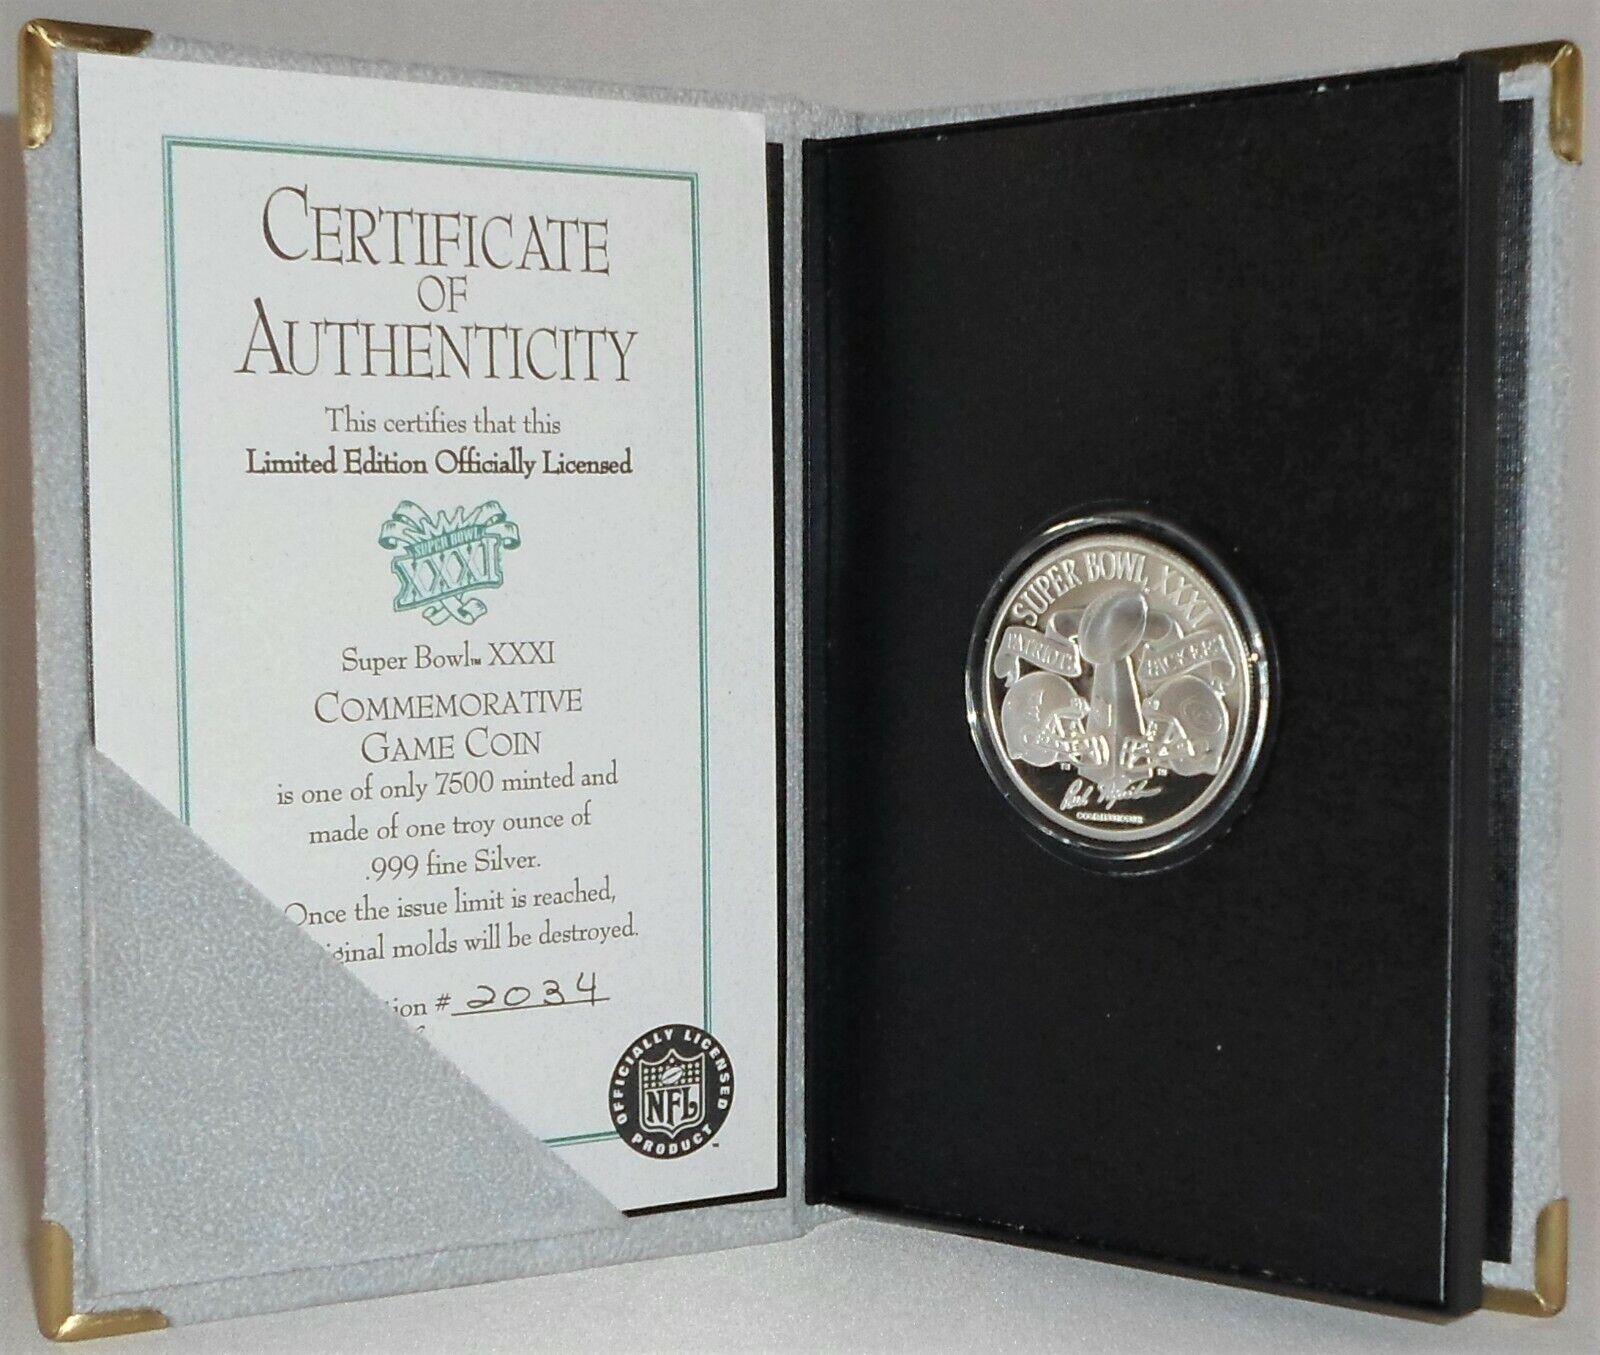 Super bowl xxxi official commemorative game coin 1 oz. .999 silver 1 of 7500